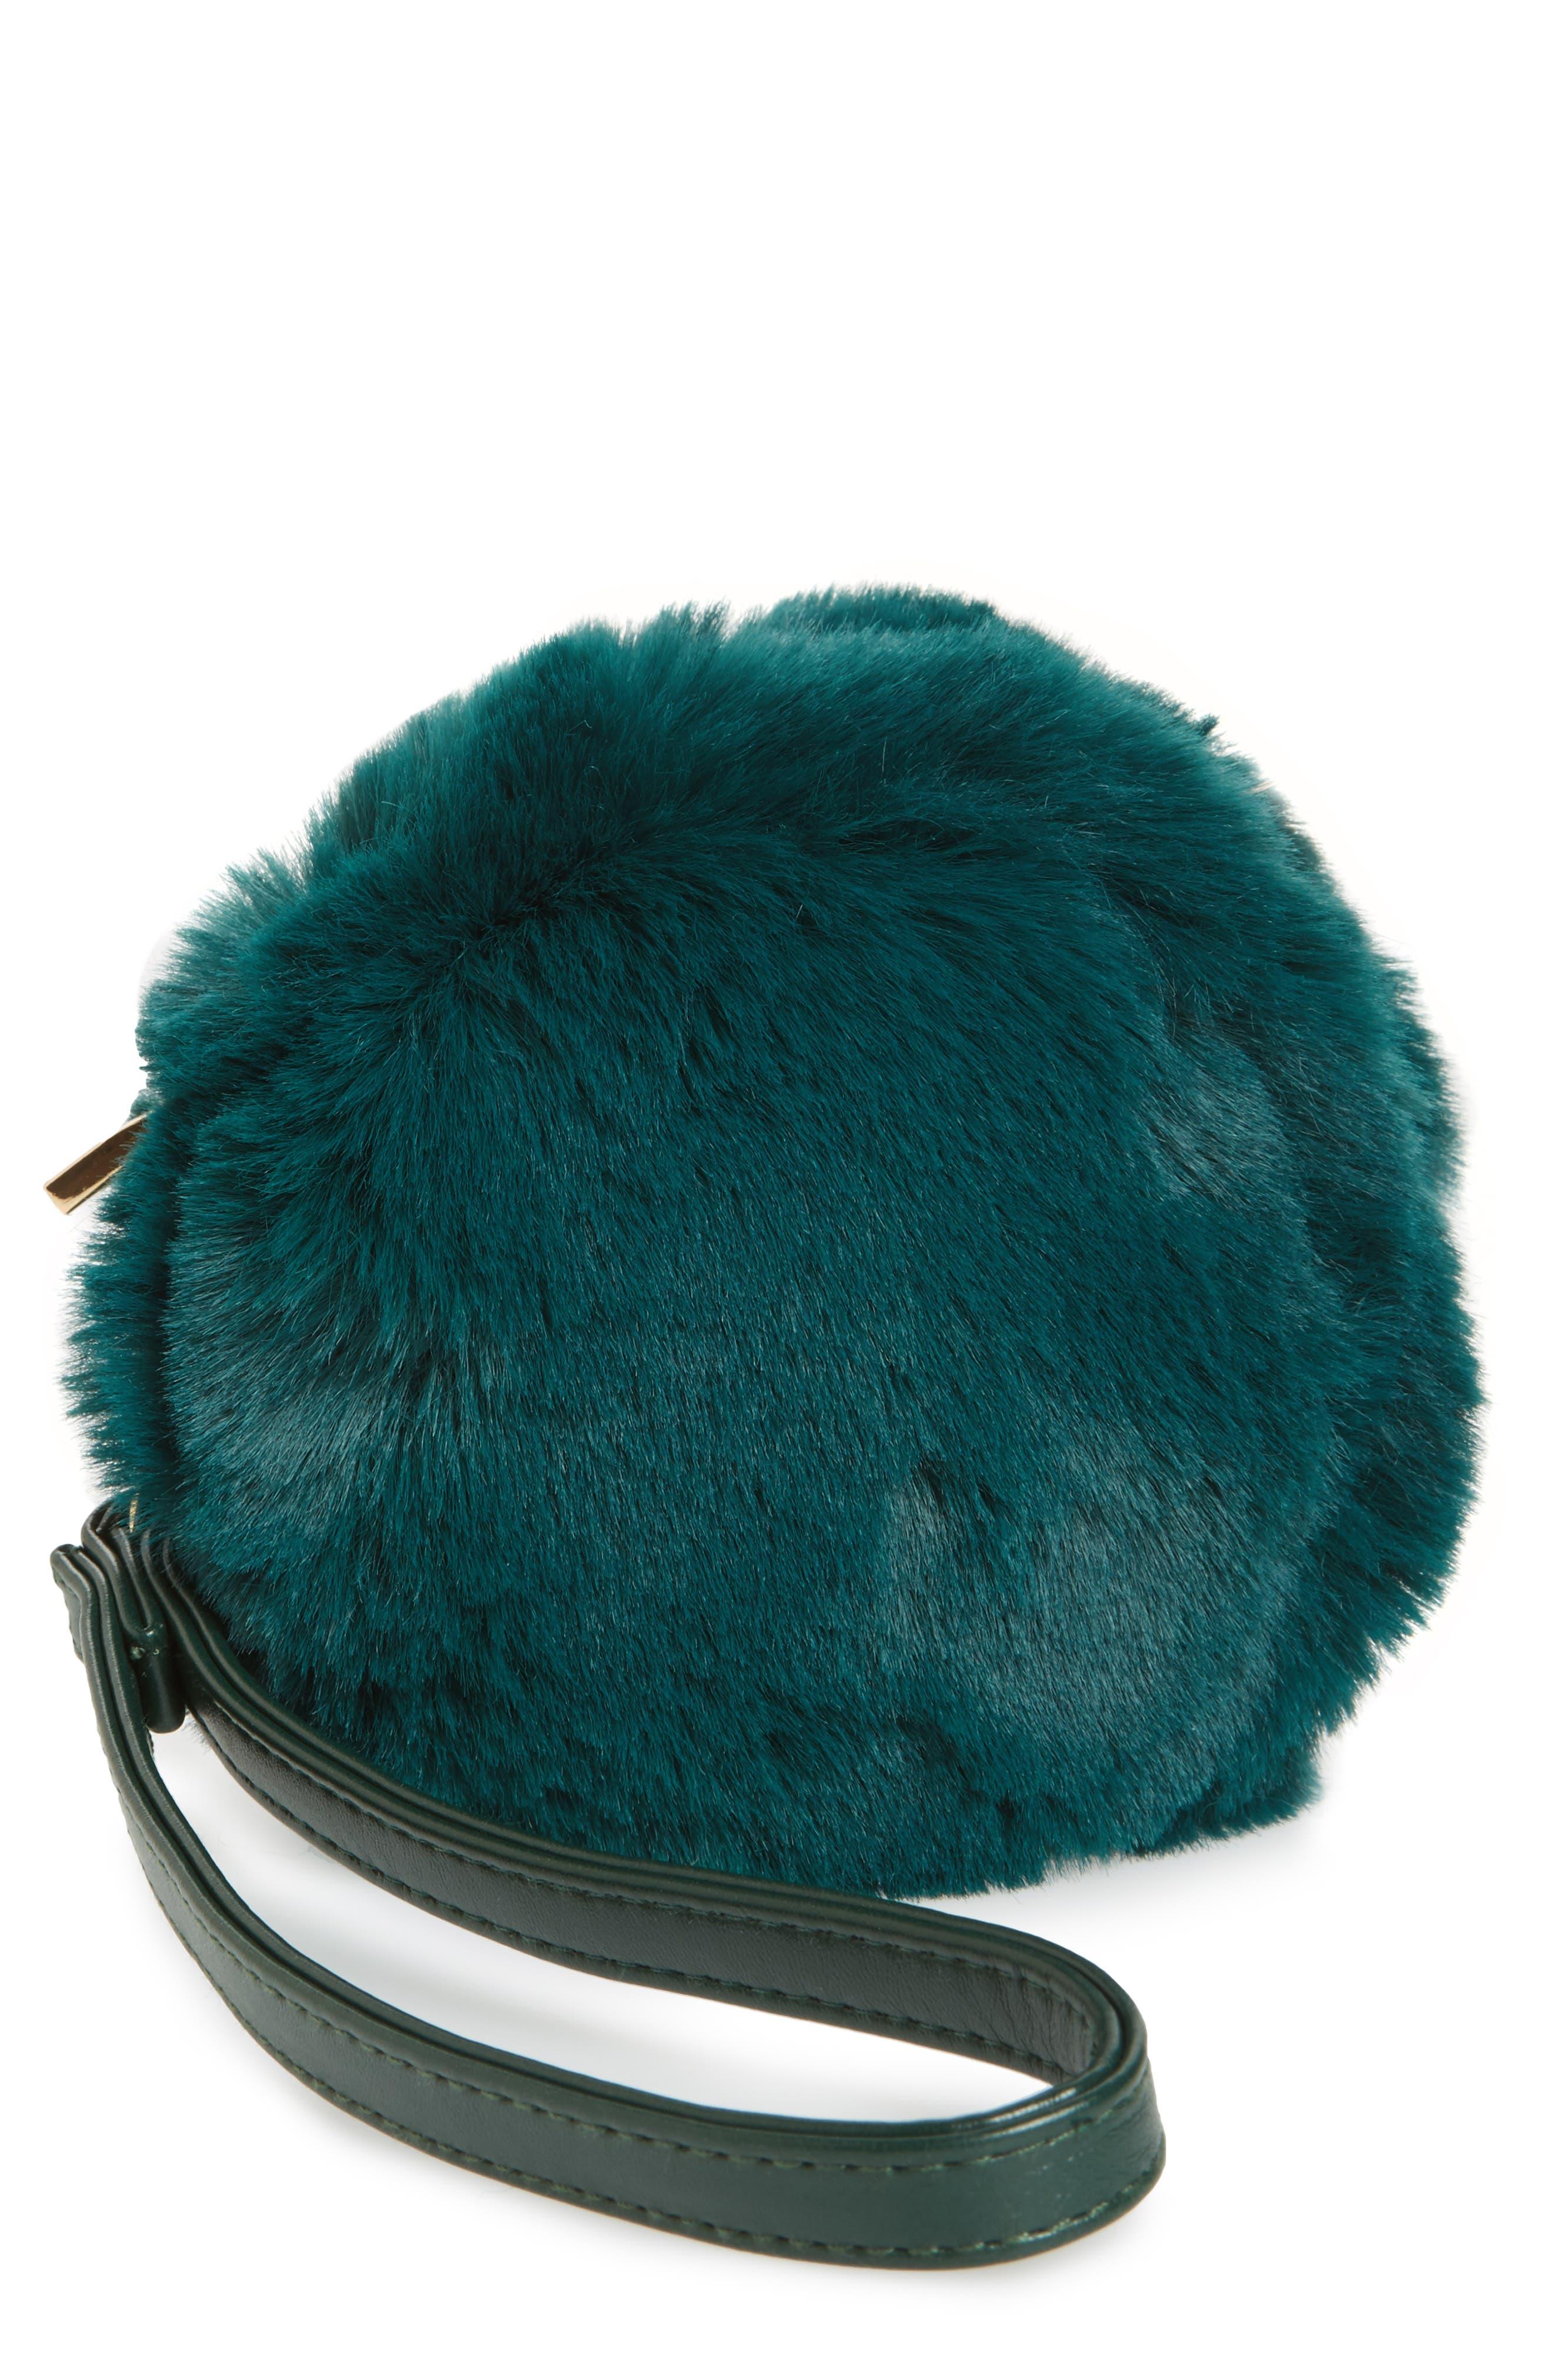 Macaron Faux Fur Wristlet,                             Main thumbnail 1, color,                             300